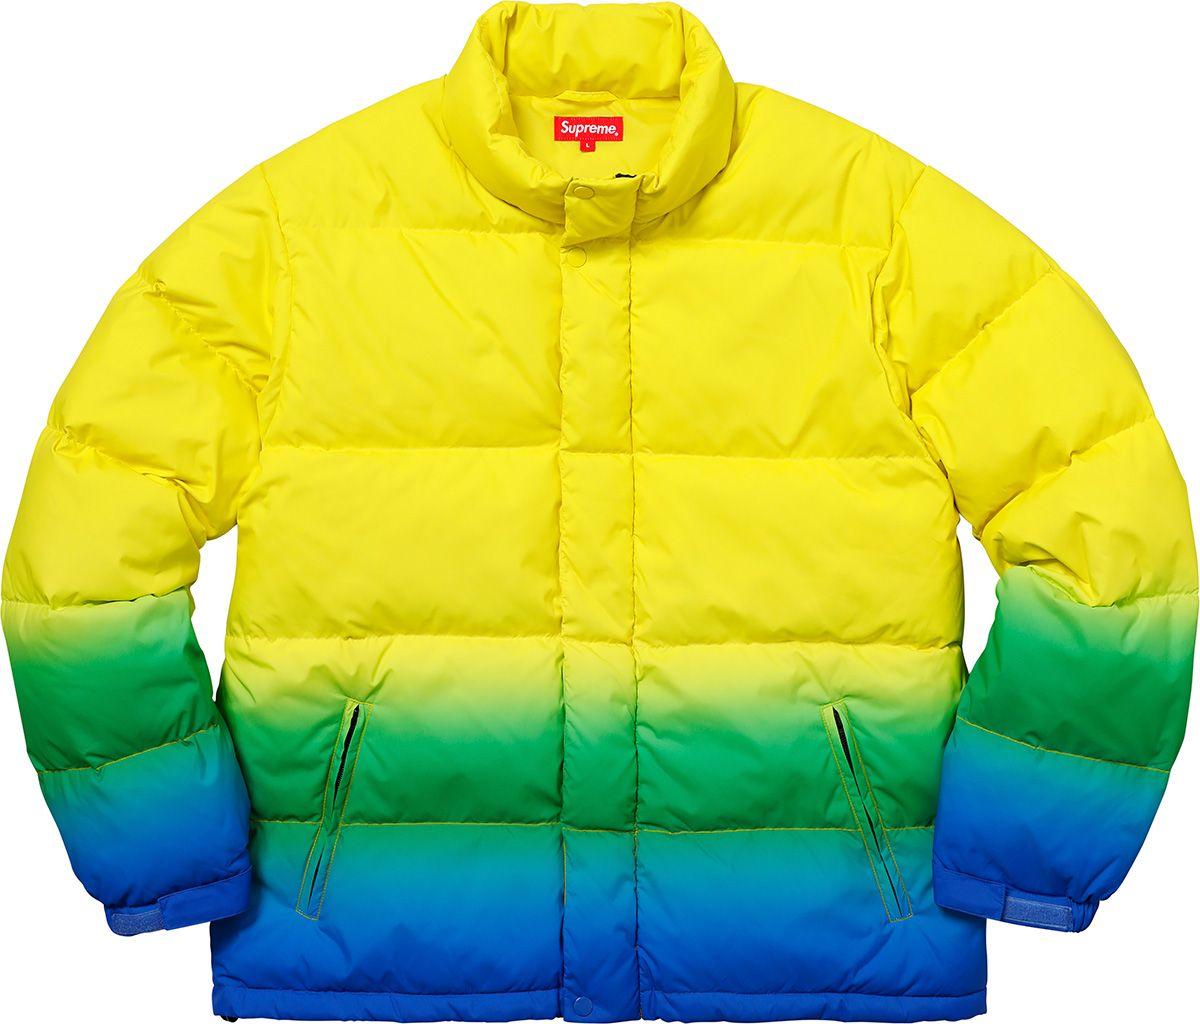 Supreme Gradient Puffy Jacket Puffy Jacket Yellow Puffer Jacket Jackets [ 1024 x 1200 Pixel ]